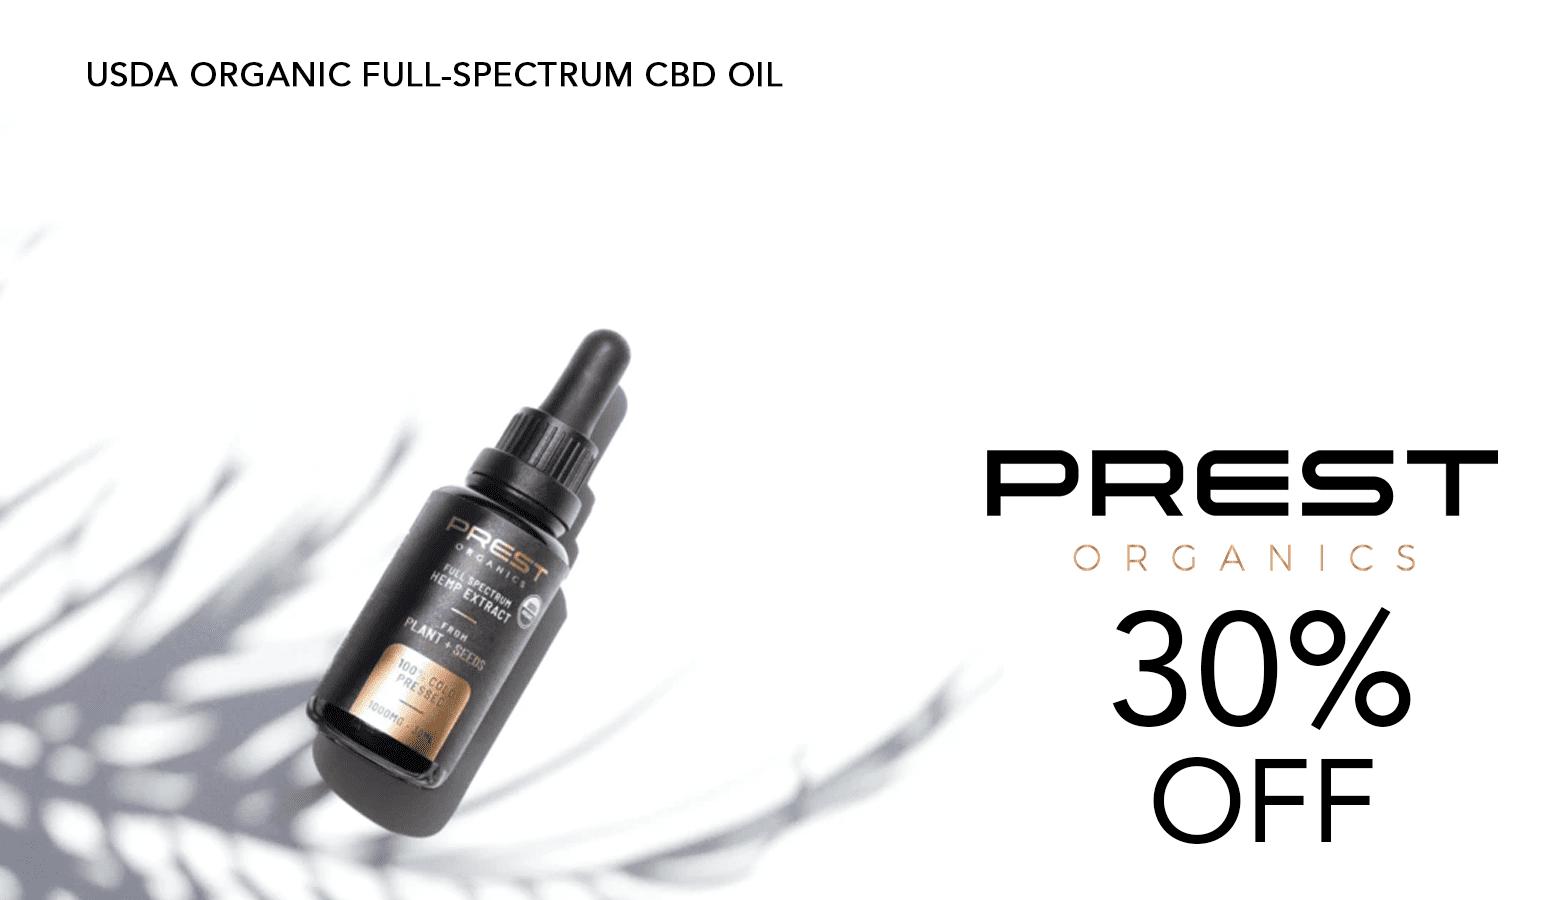 Prest Organics Coupon Code Website